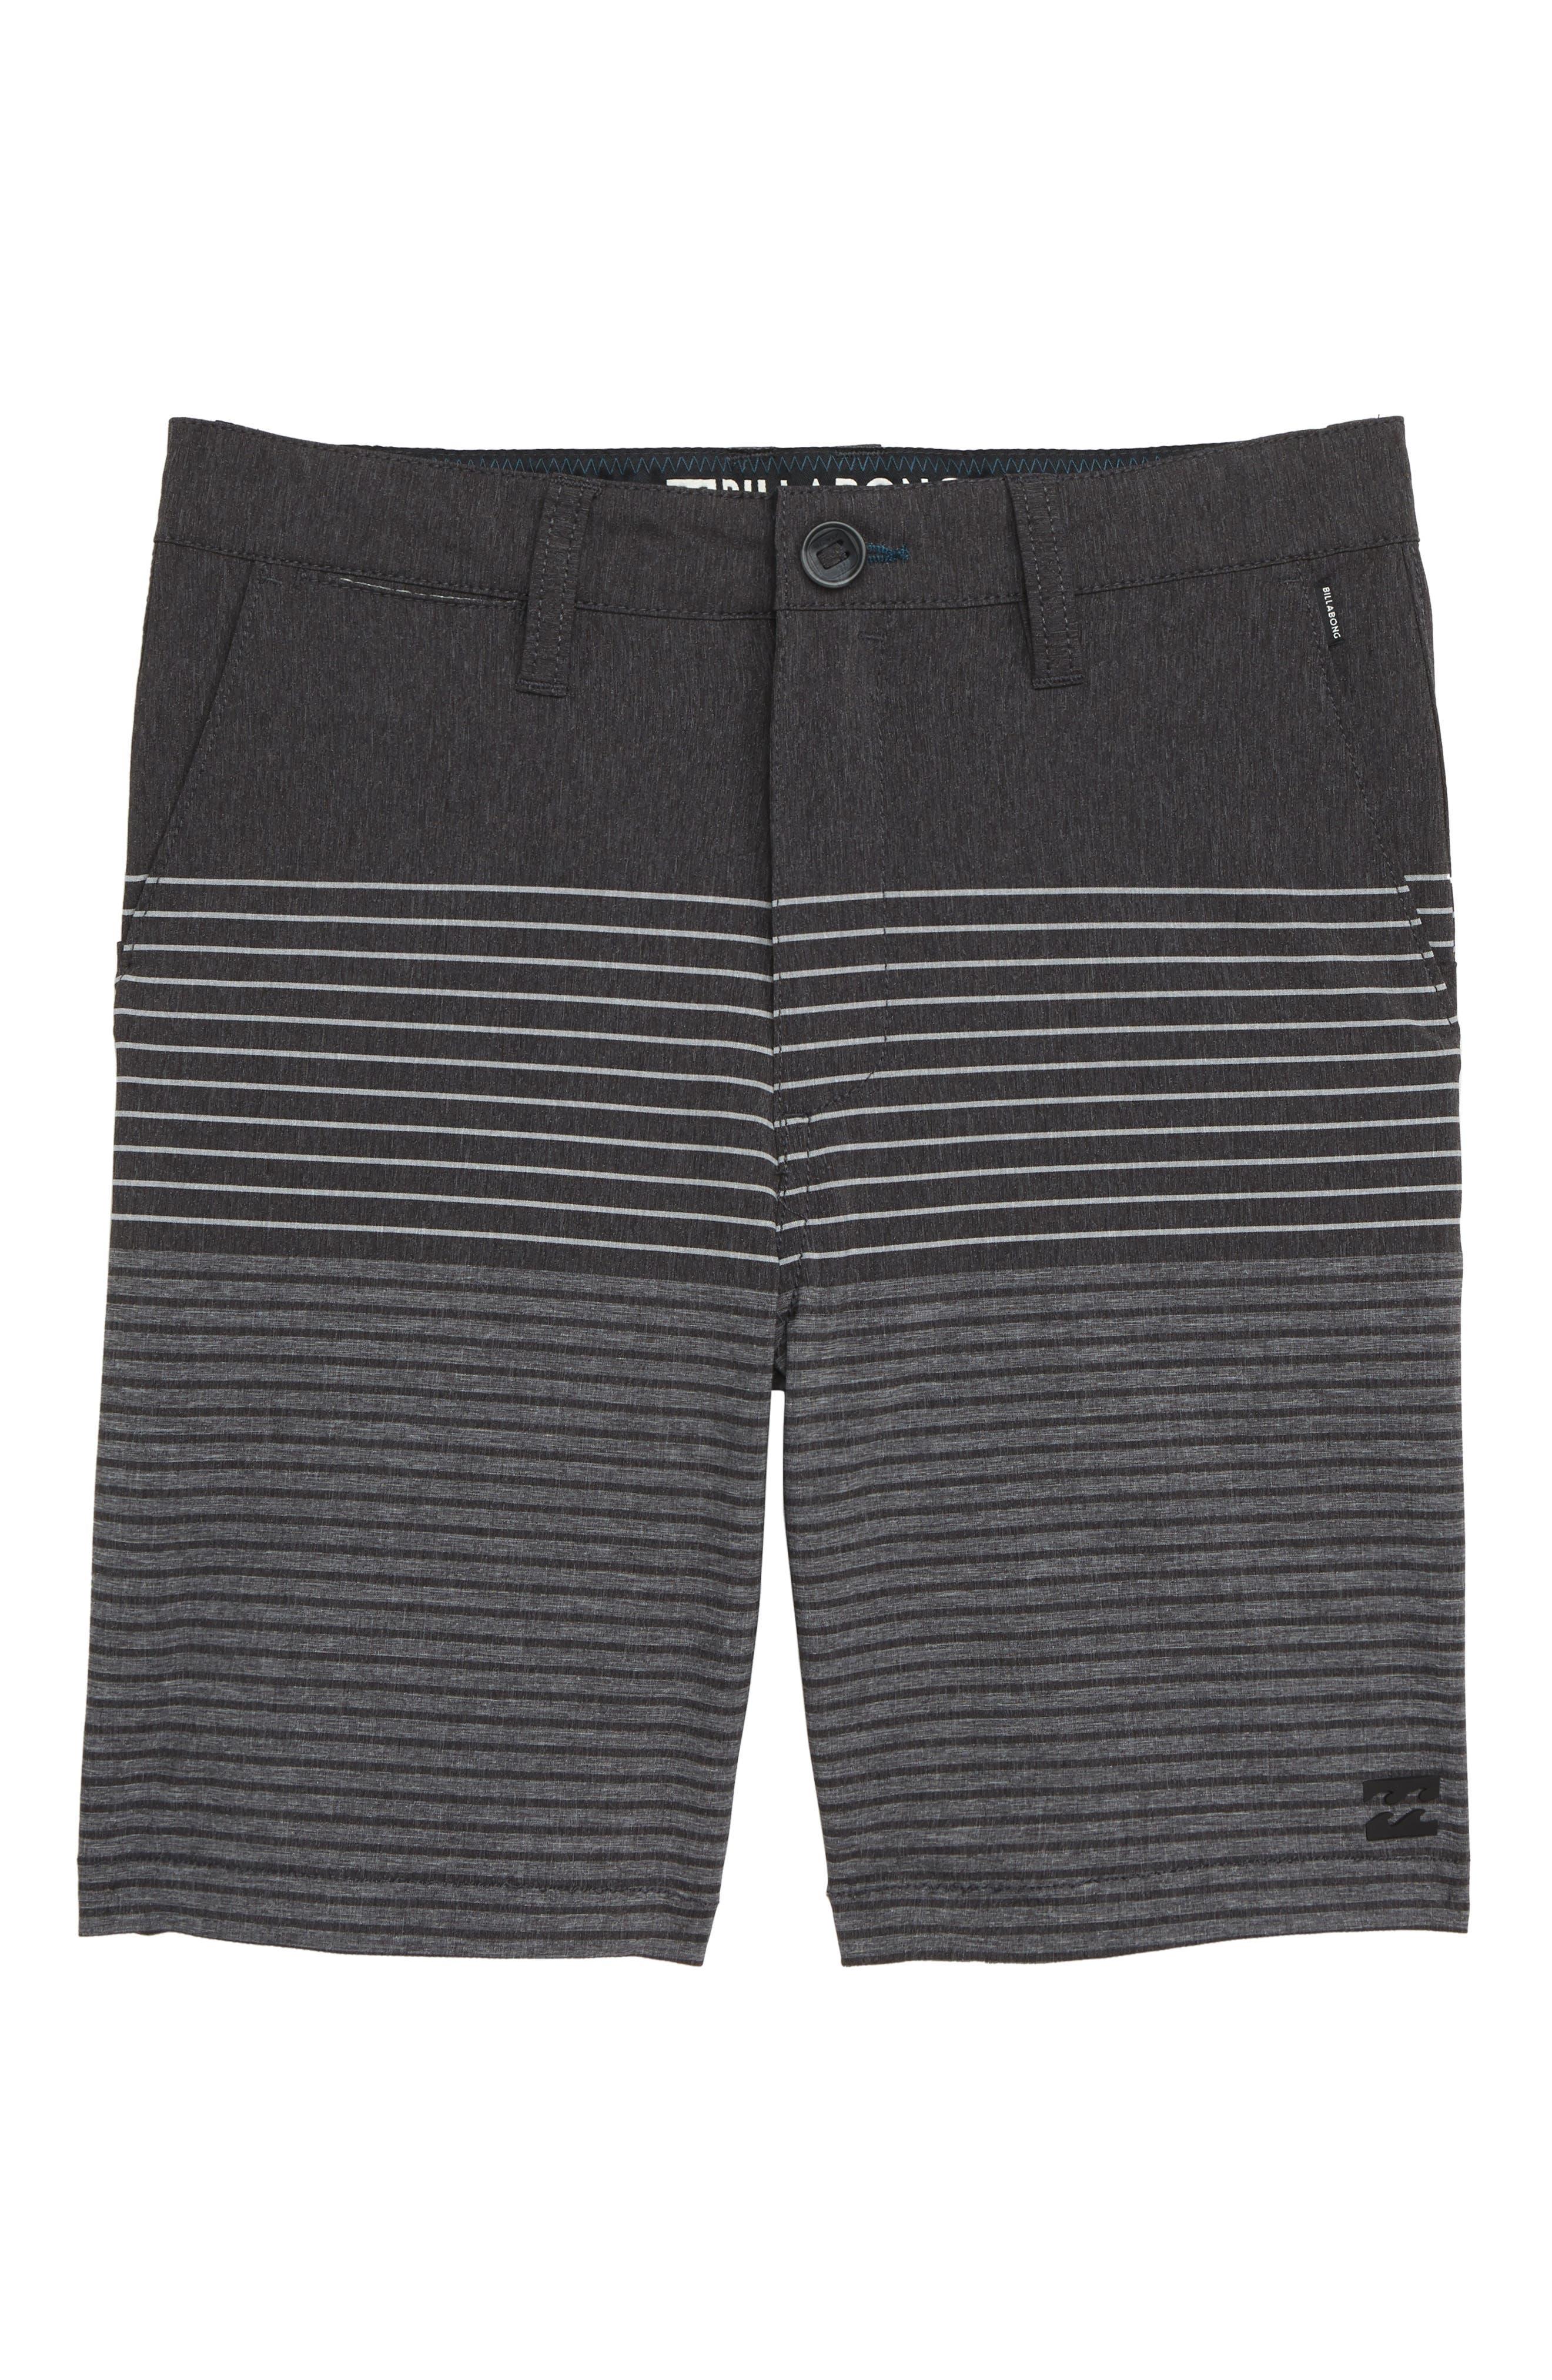 Boys Billabong Crossfire X Stripe Hybrid Shorts Size 30  Grey